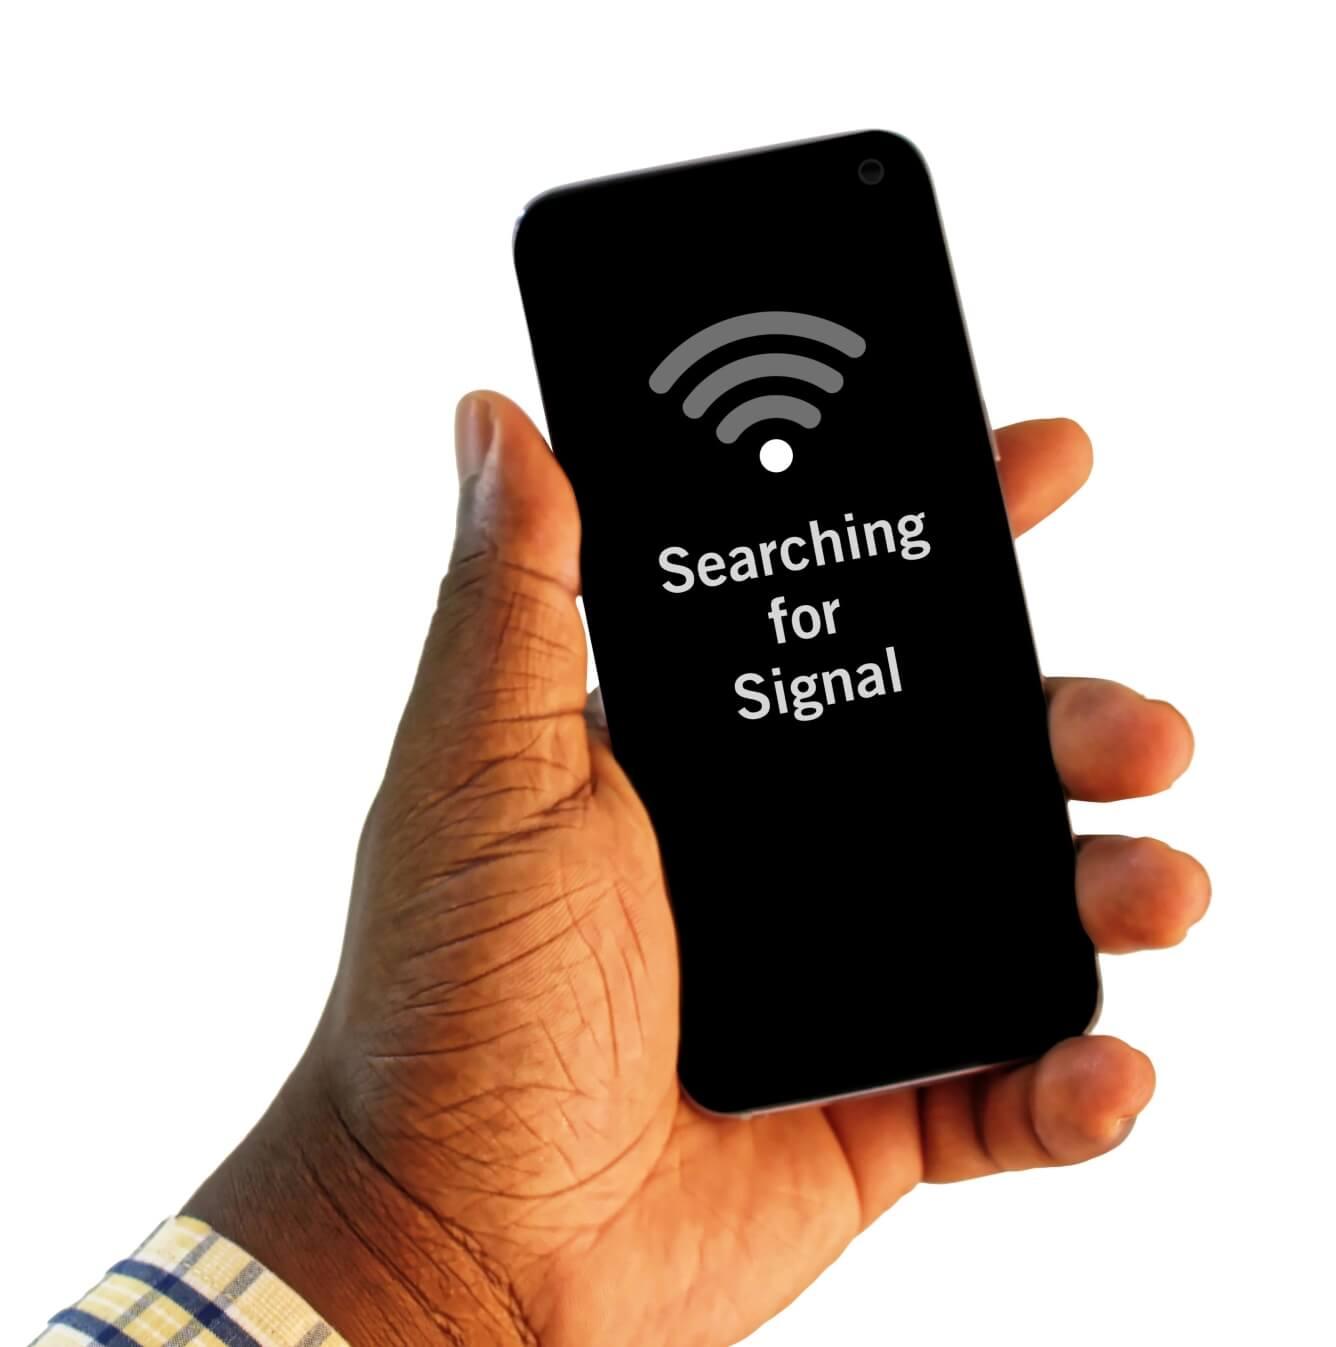 Hiboost-No-Service-Phone